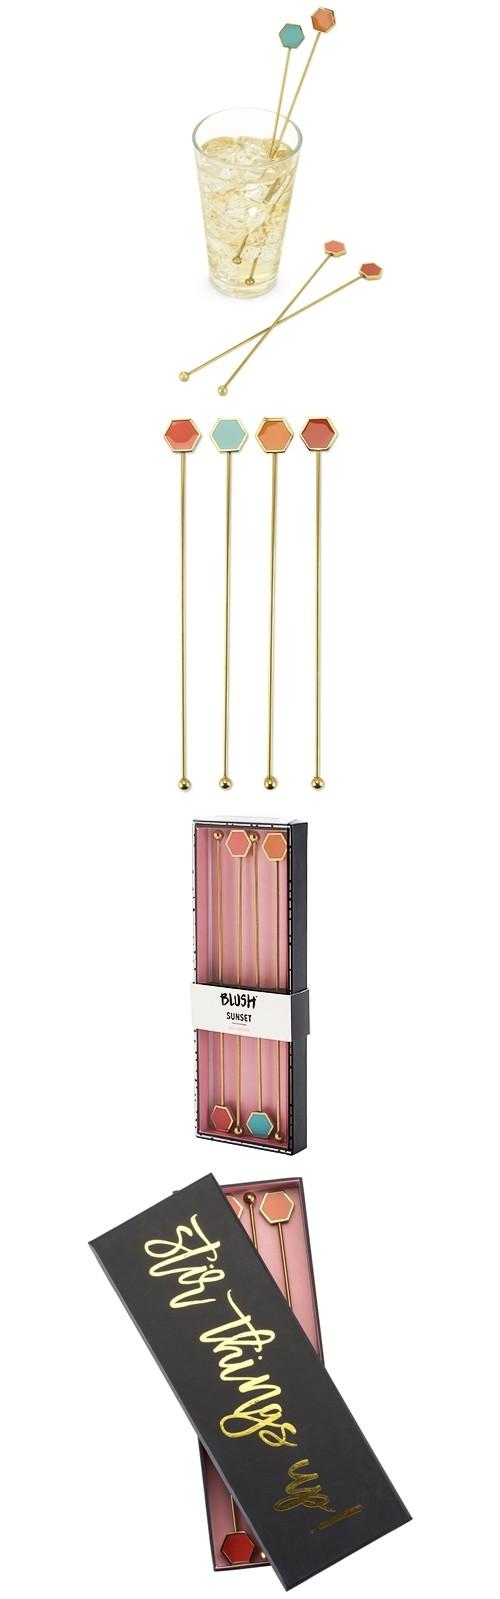 """Sunset"" Geo Enamel Inlay Stir Sticks by Blush (Set of 4)"